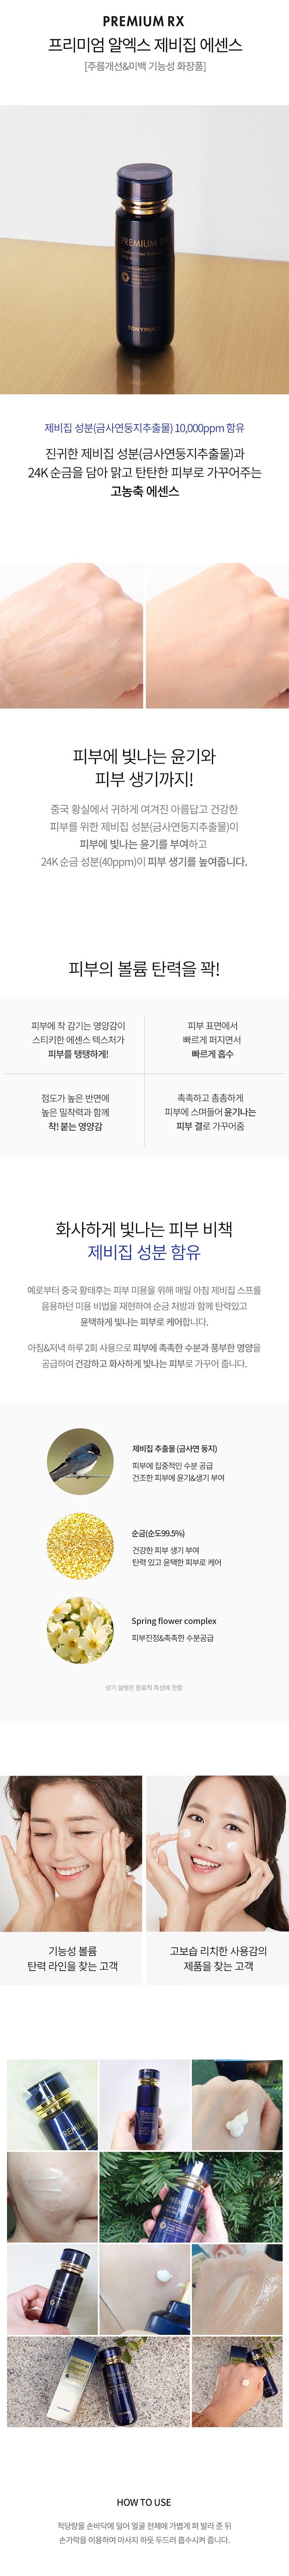 TONYMOLY Premium RX Swallow Nest Essence korean skincare product online shop malaysia hong kong new zealand1